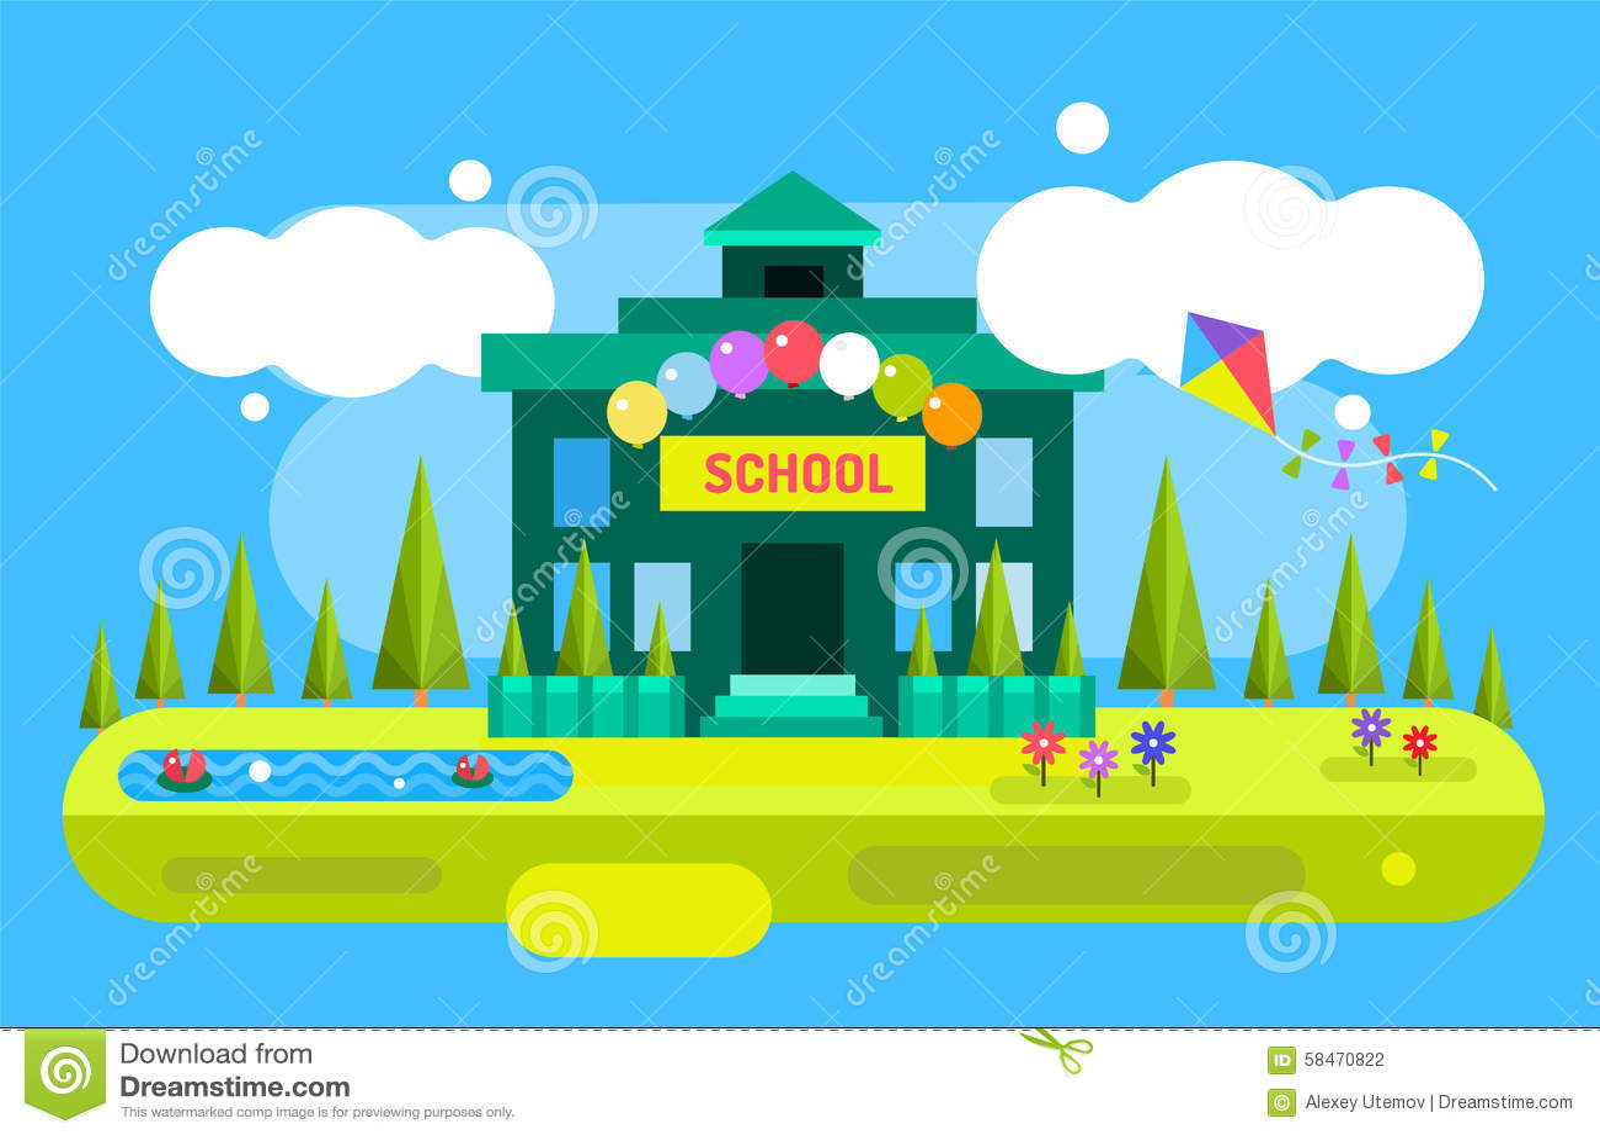 Community Building Games Elementary School